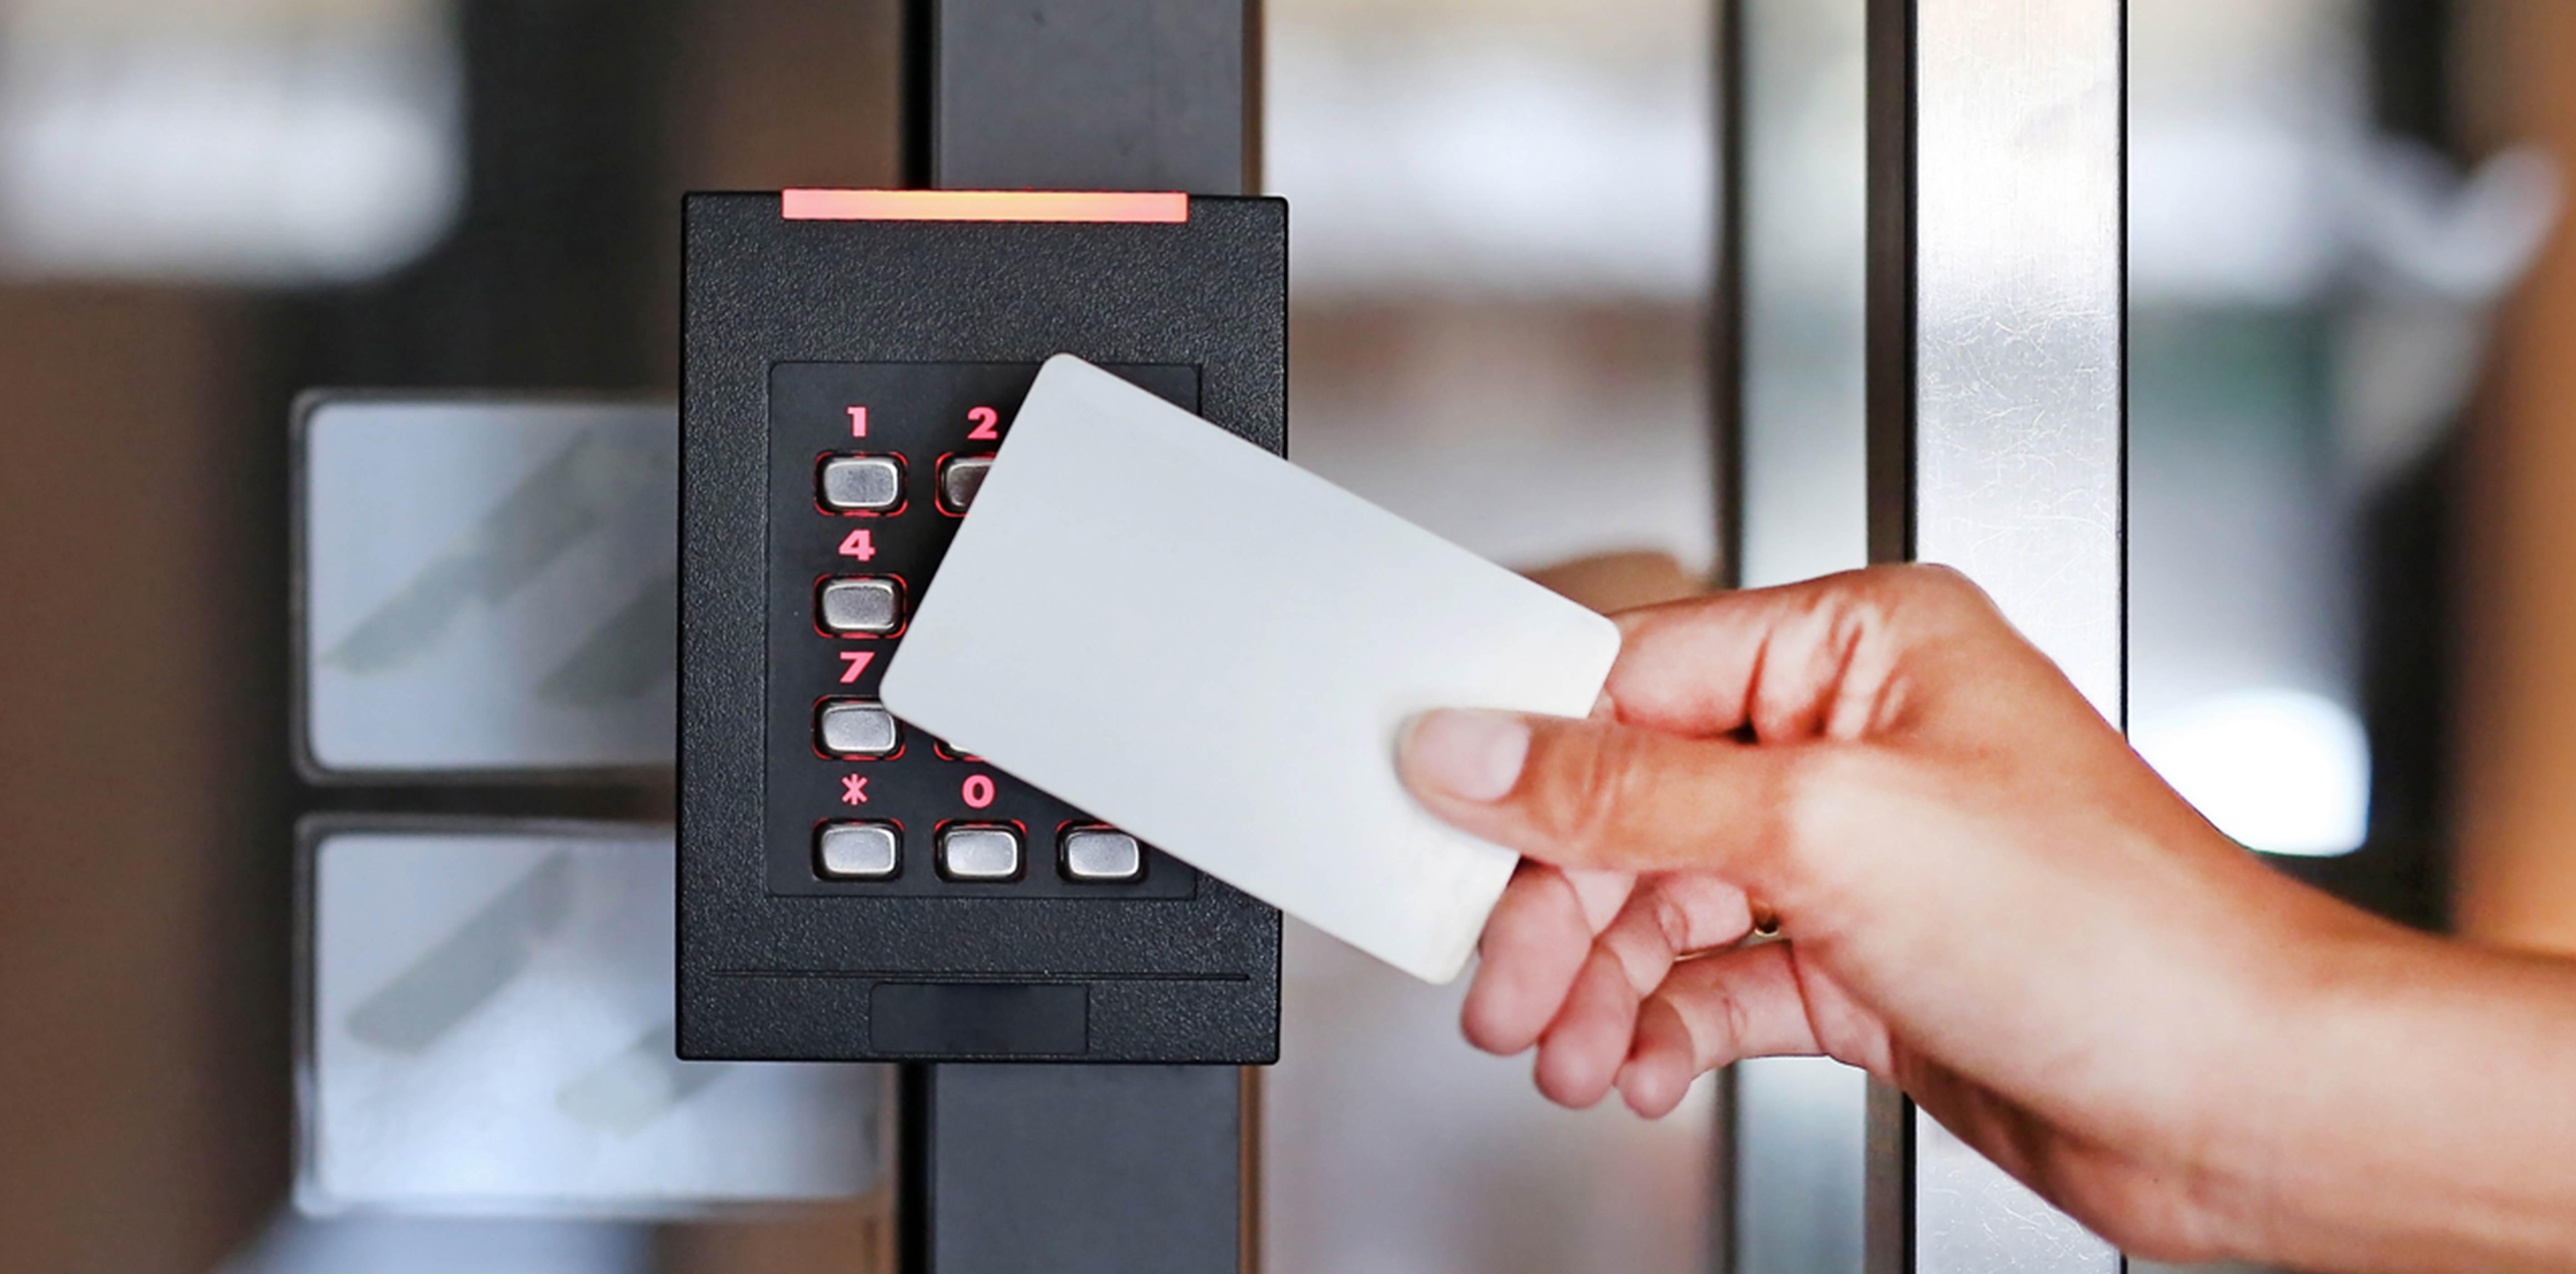 Security & Access Control